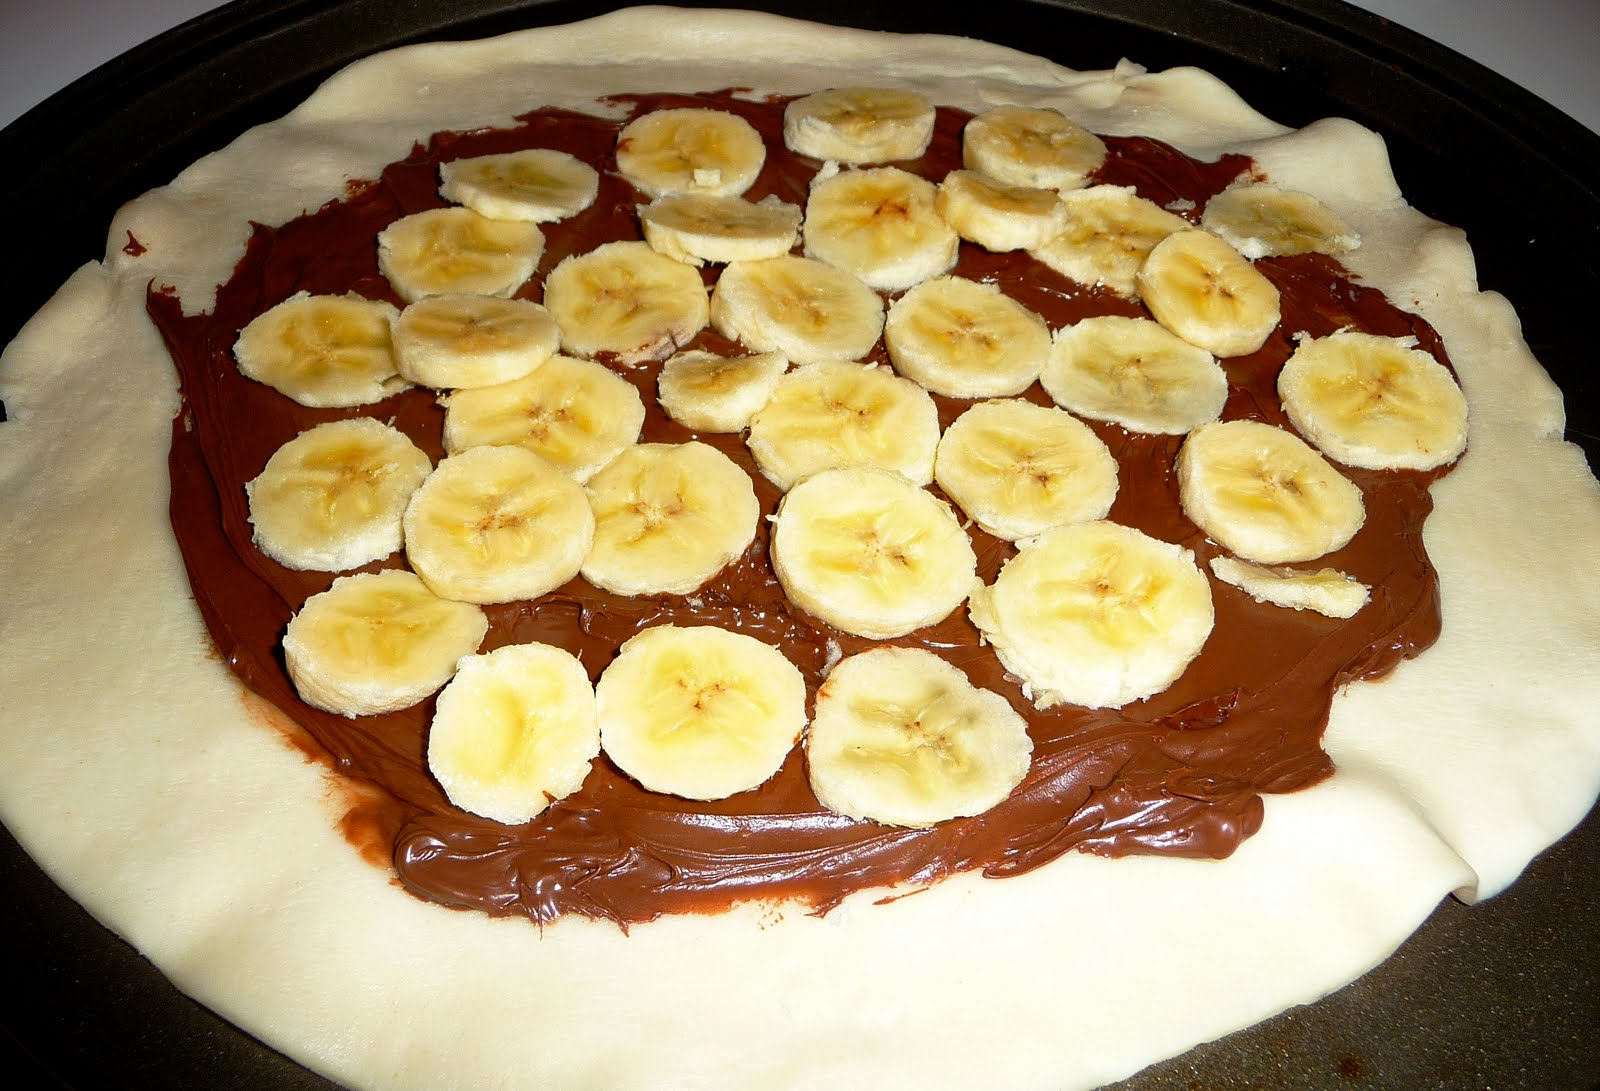 Live.Love.Eat: Banana-Nutella Galette